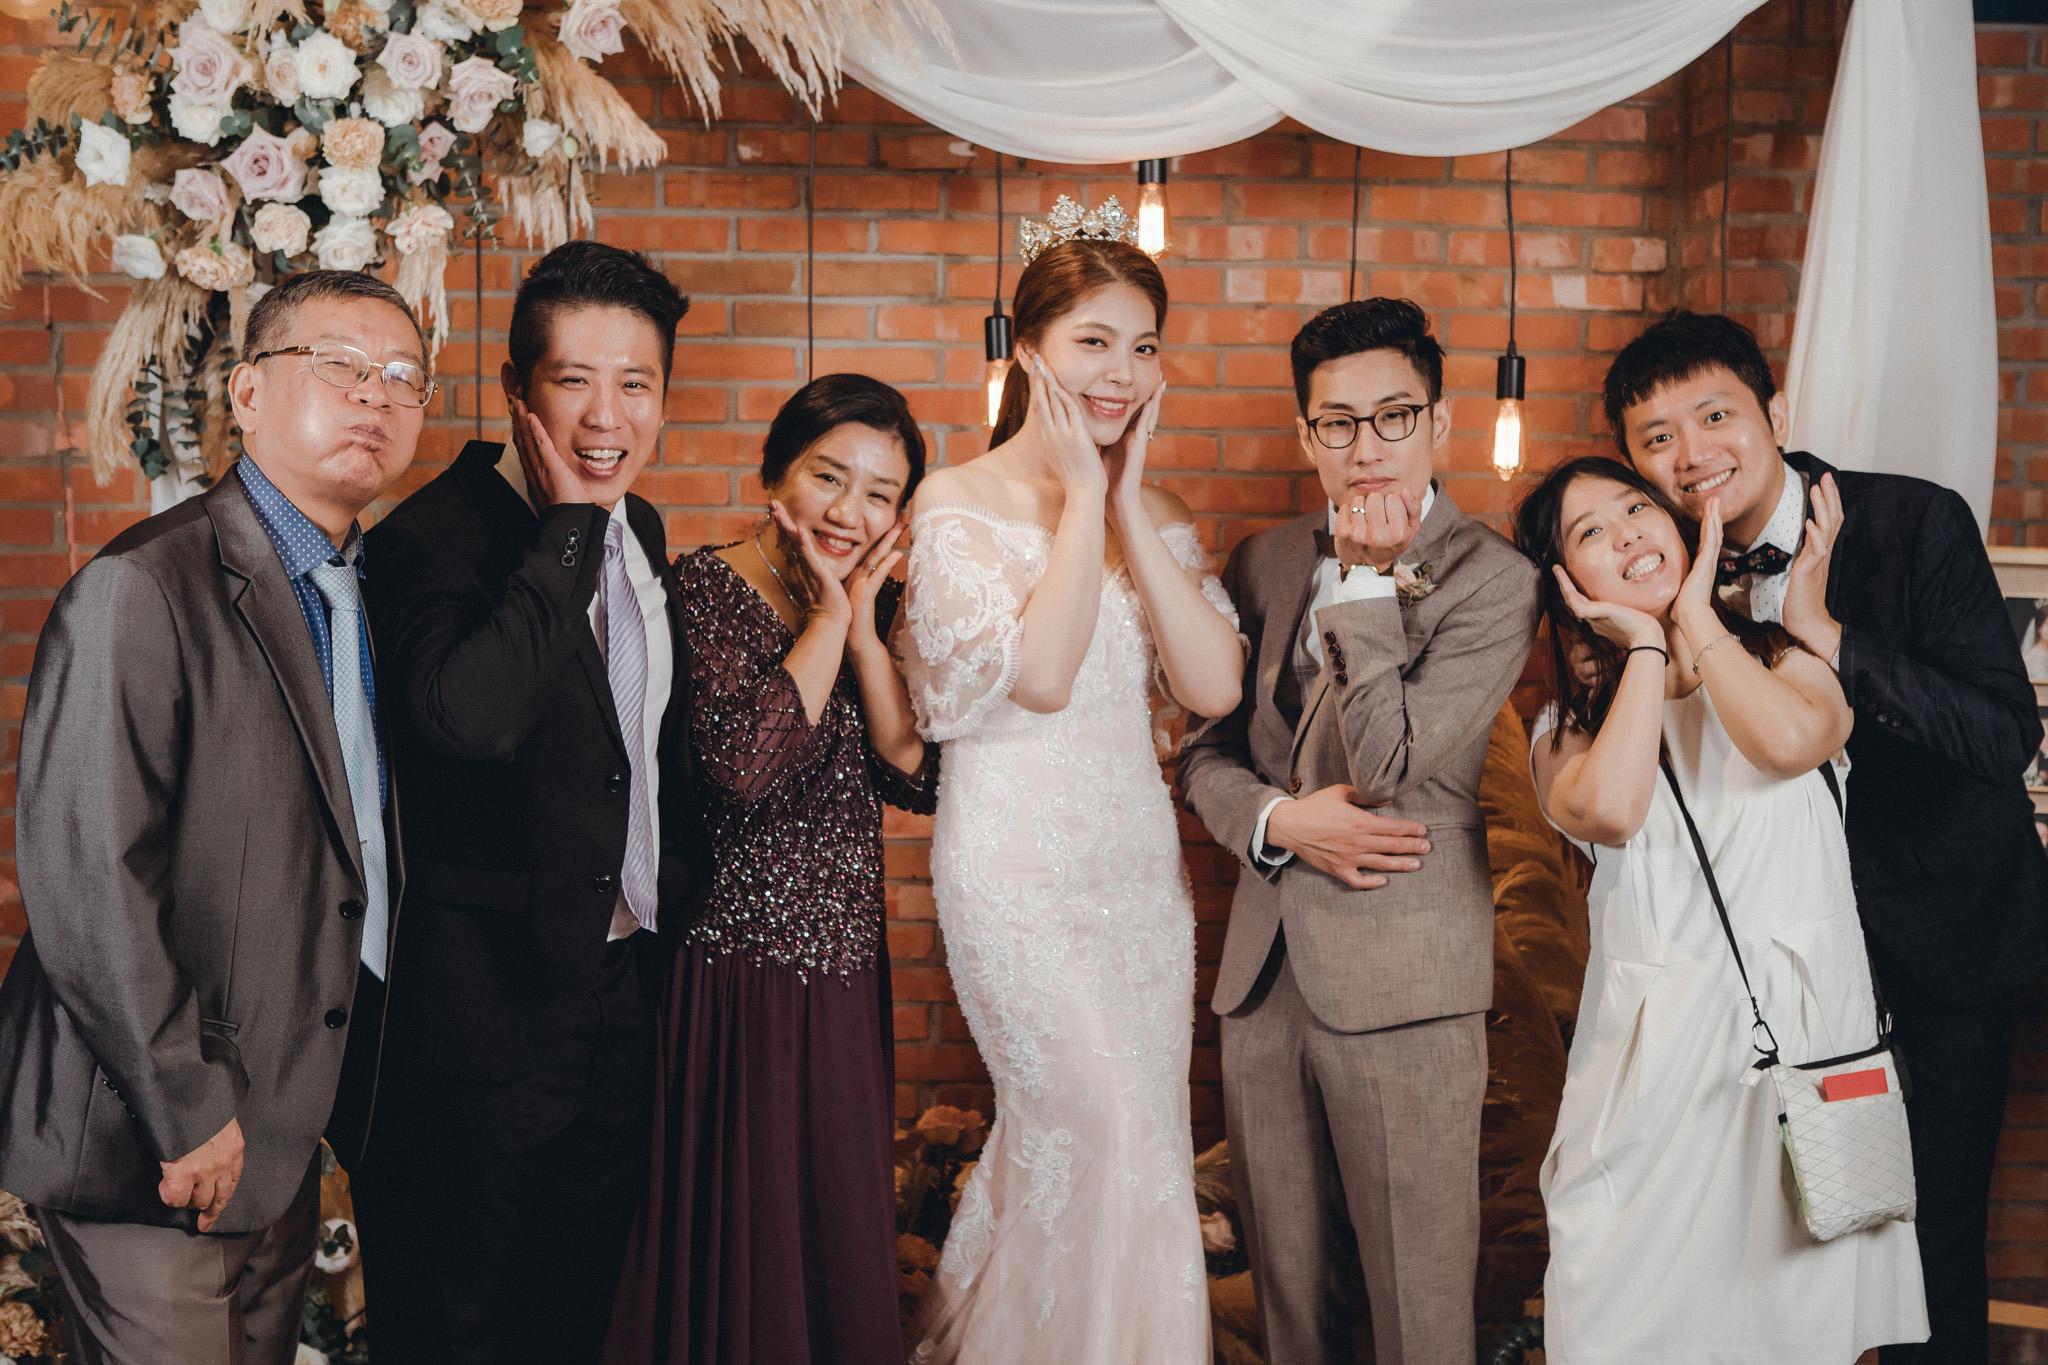 EW 台北婚攝 居米 濟南教會 Brick Yard 33 美軍俱樂部 婚禮 婚宴-114